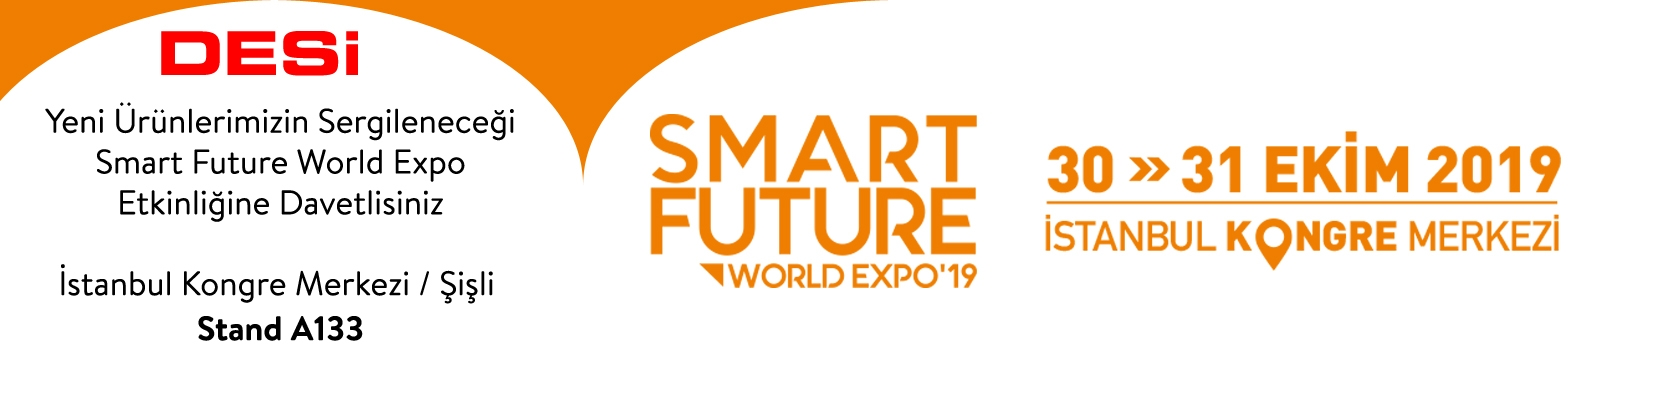 Smart Future World Expo 2019